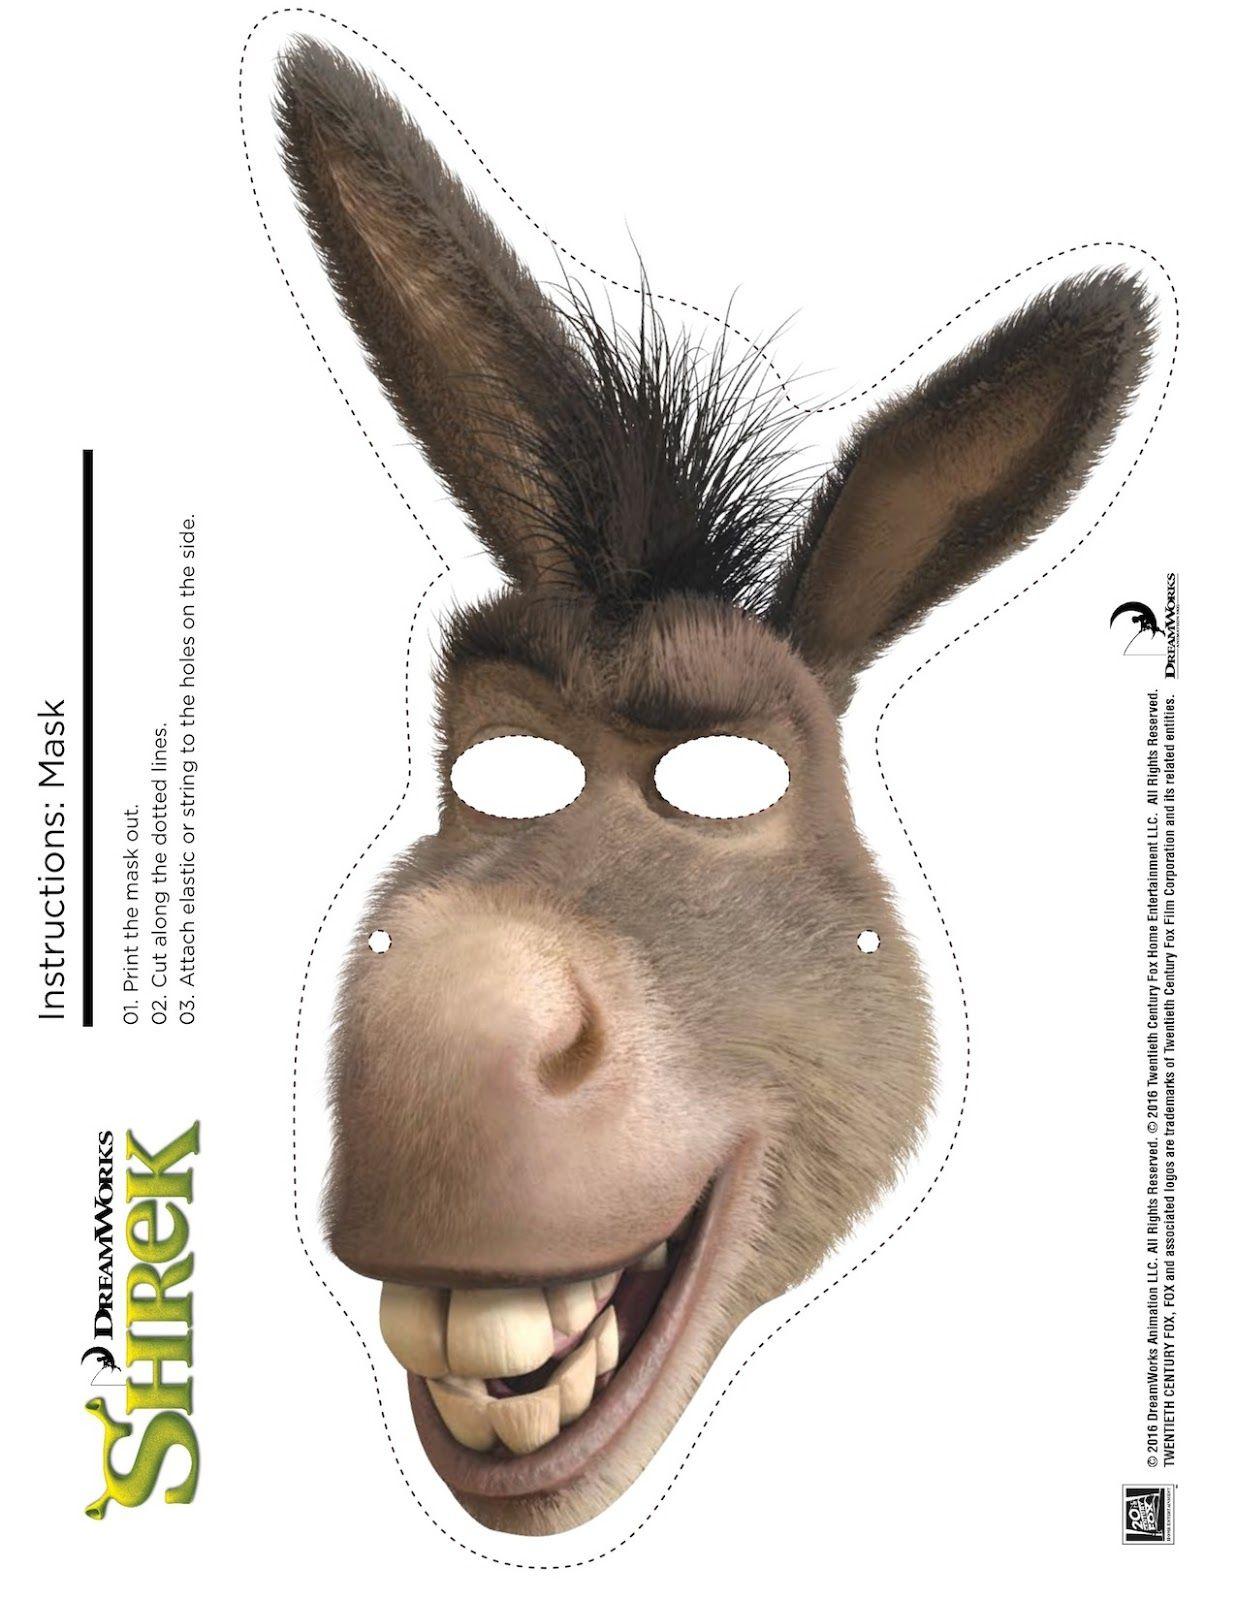 Shrek Photo Booth Props: Free Printable Shrek Mask   Shrek Birthday - Free Printable Shrek Birthday Invitations